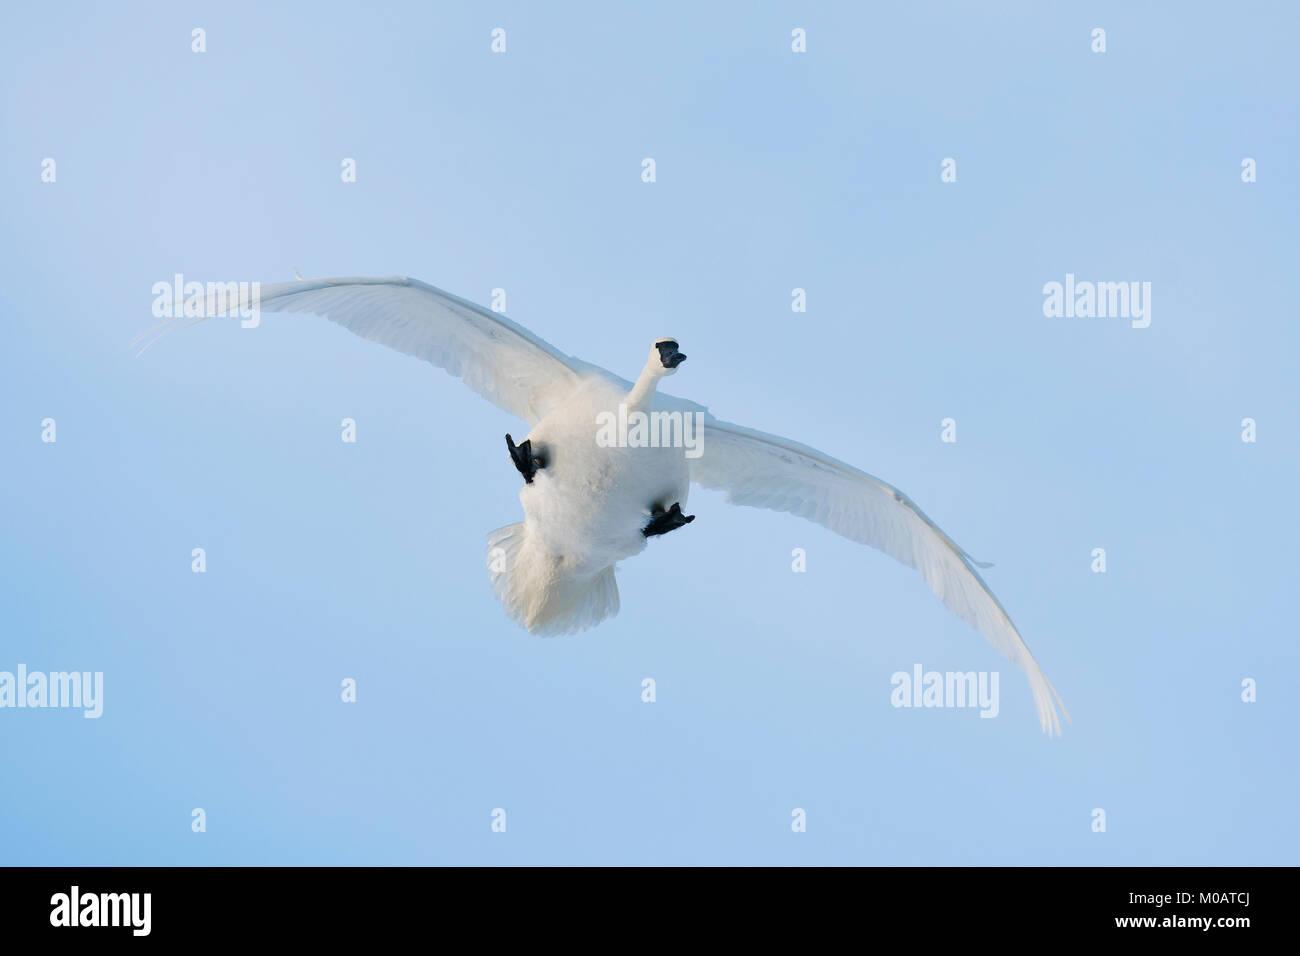 Trumpeter swans (Cygnus buccinator), USA, by Dominique Braud/Dembinsky Photo Assoc - Stock Image